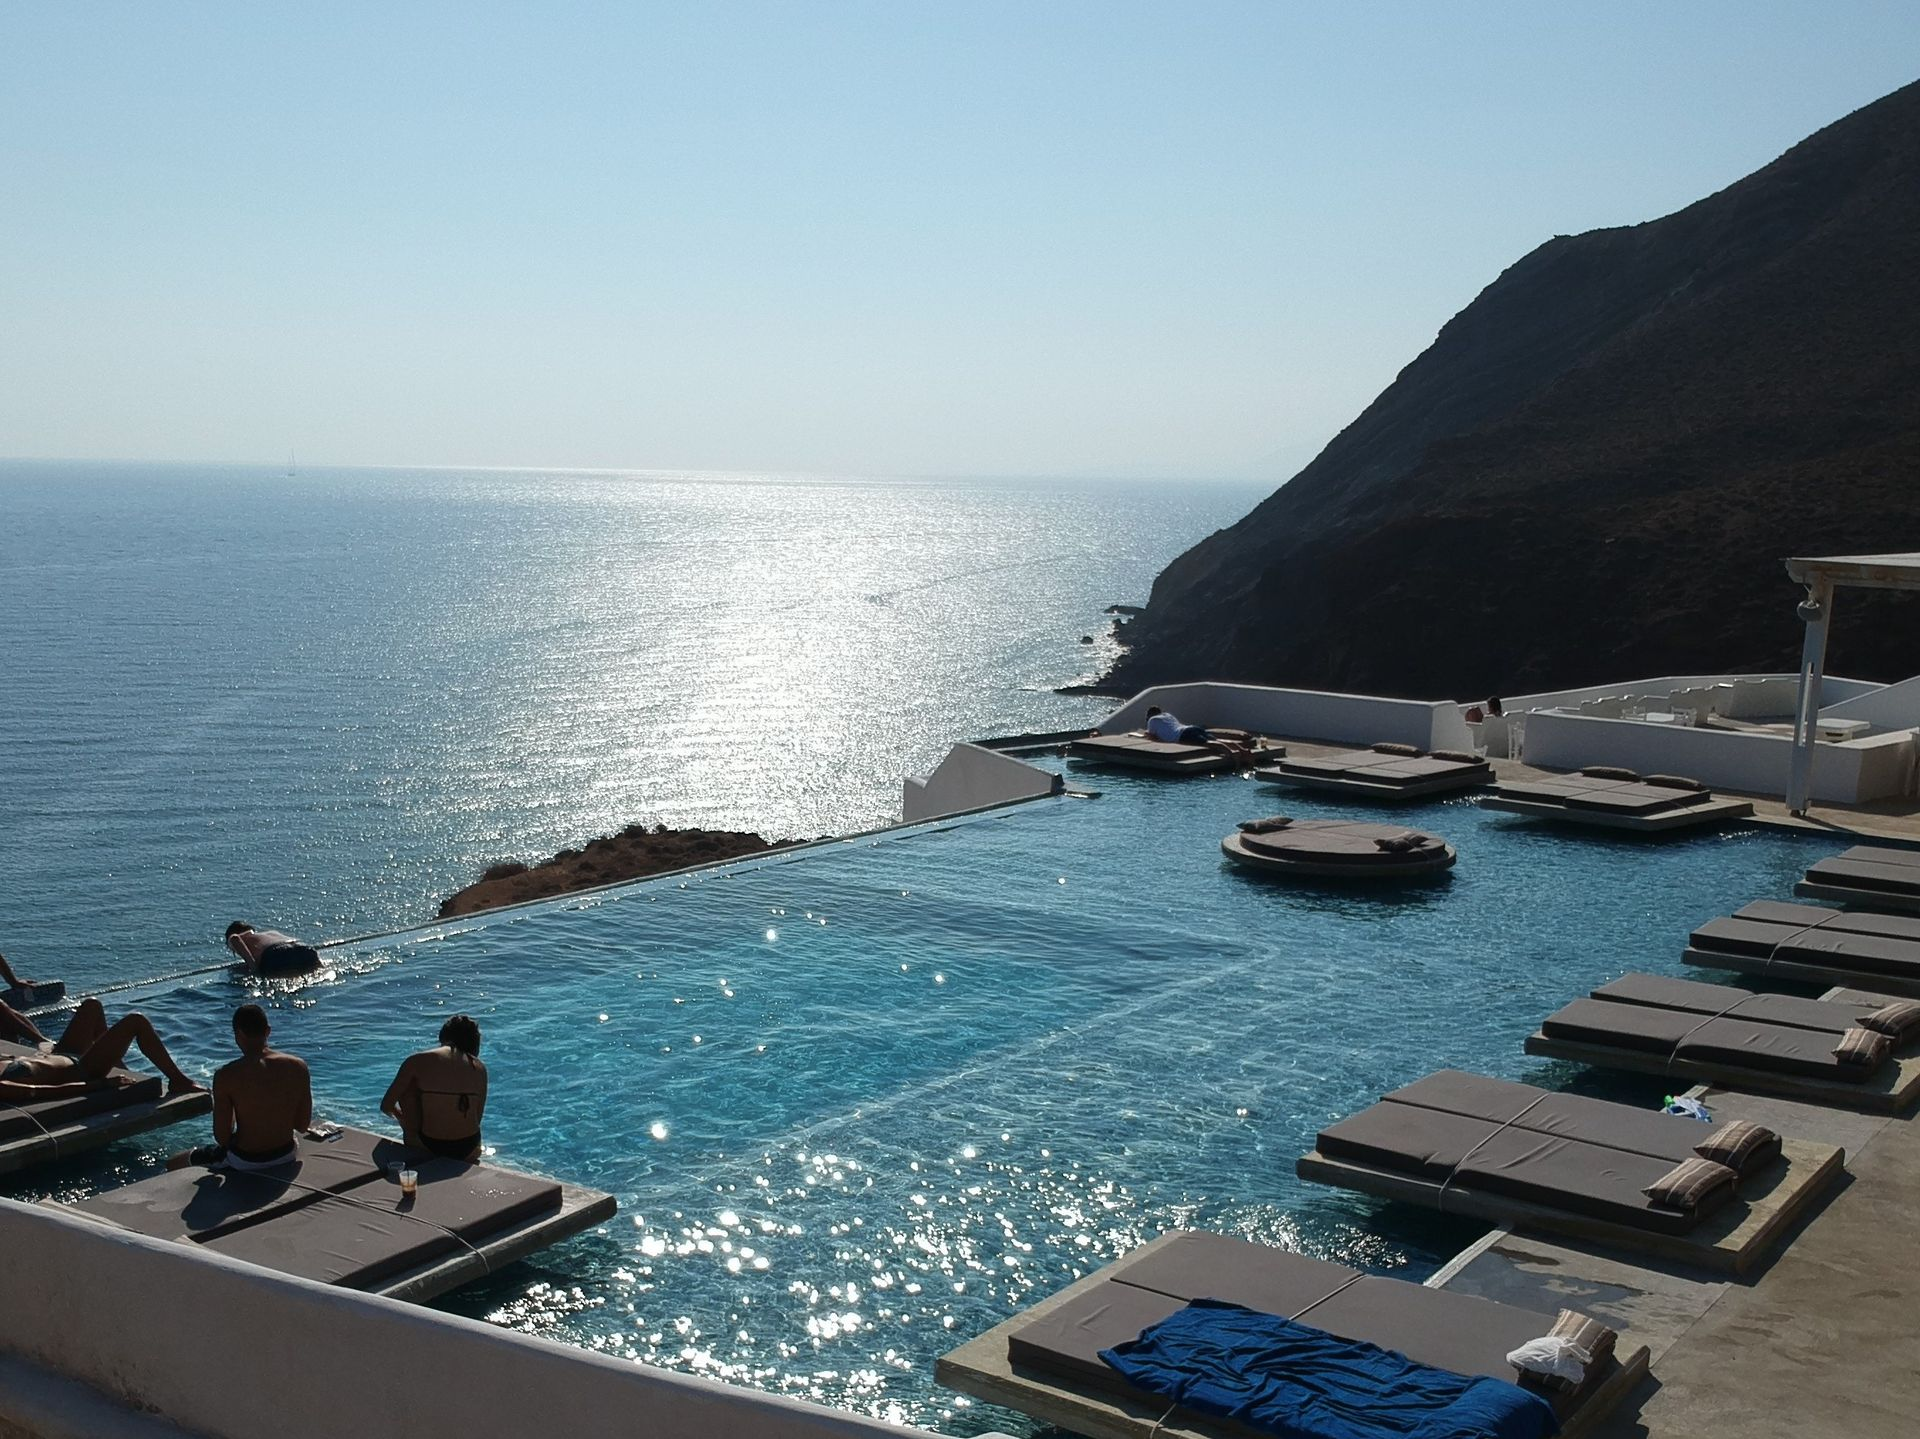 Golden Beach Resort Anafi - Ανάφη   2 Ημέρες (1 Διανυκτέρευση)   2 άτομα   Πρωινό   έως 31/08/2019   Free WiFi